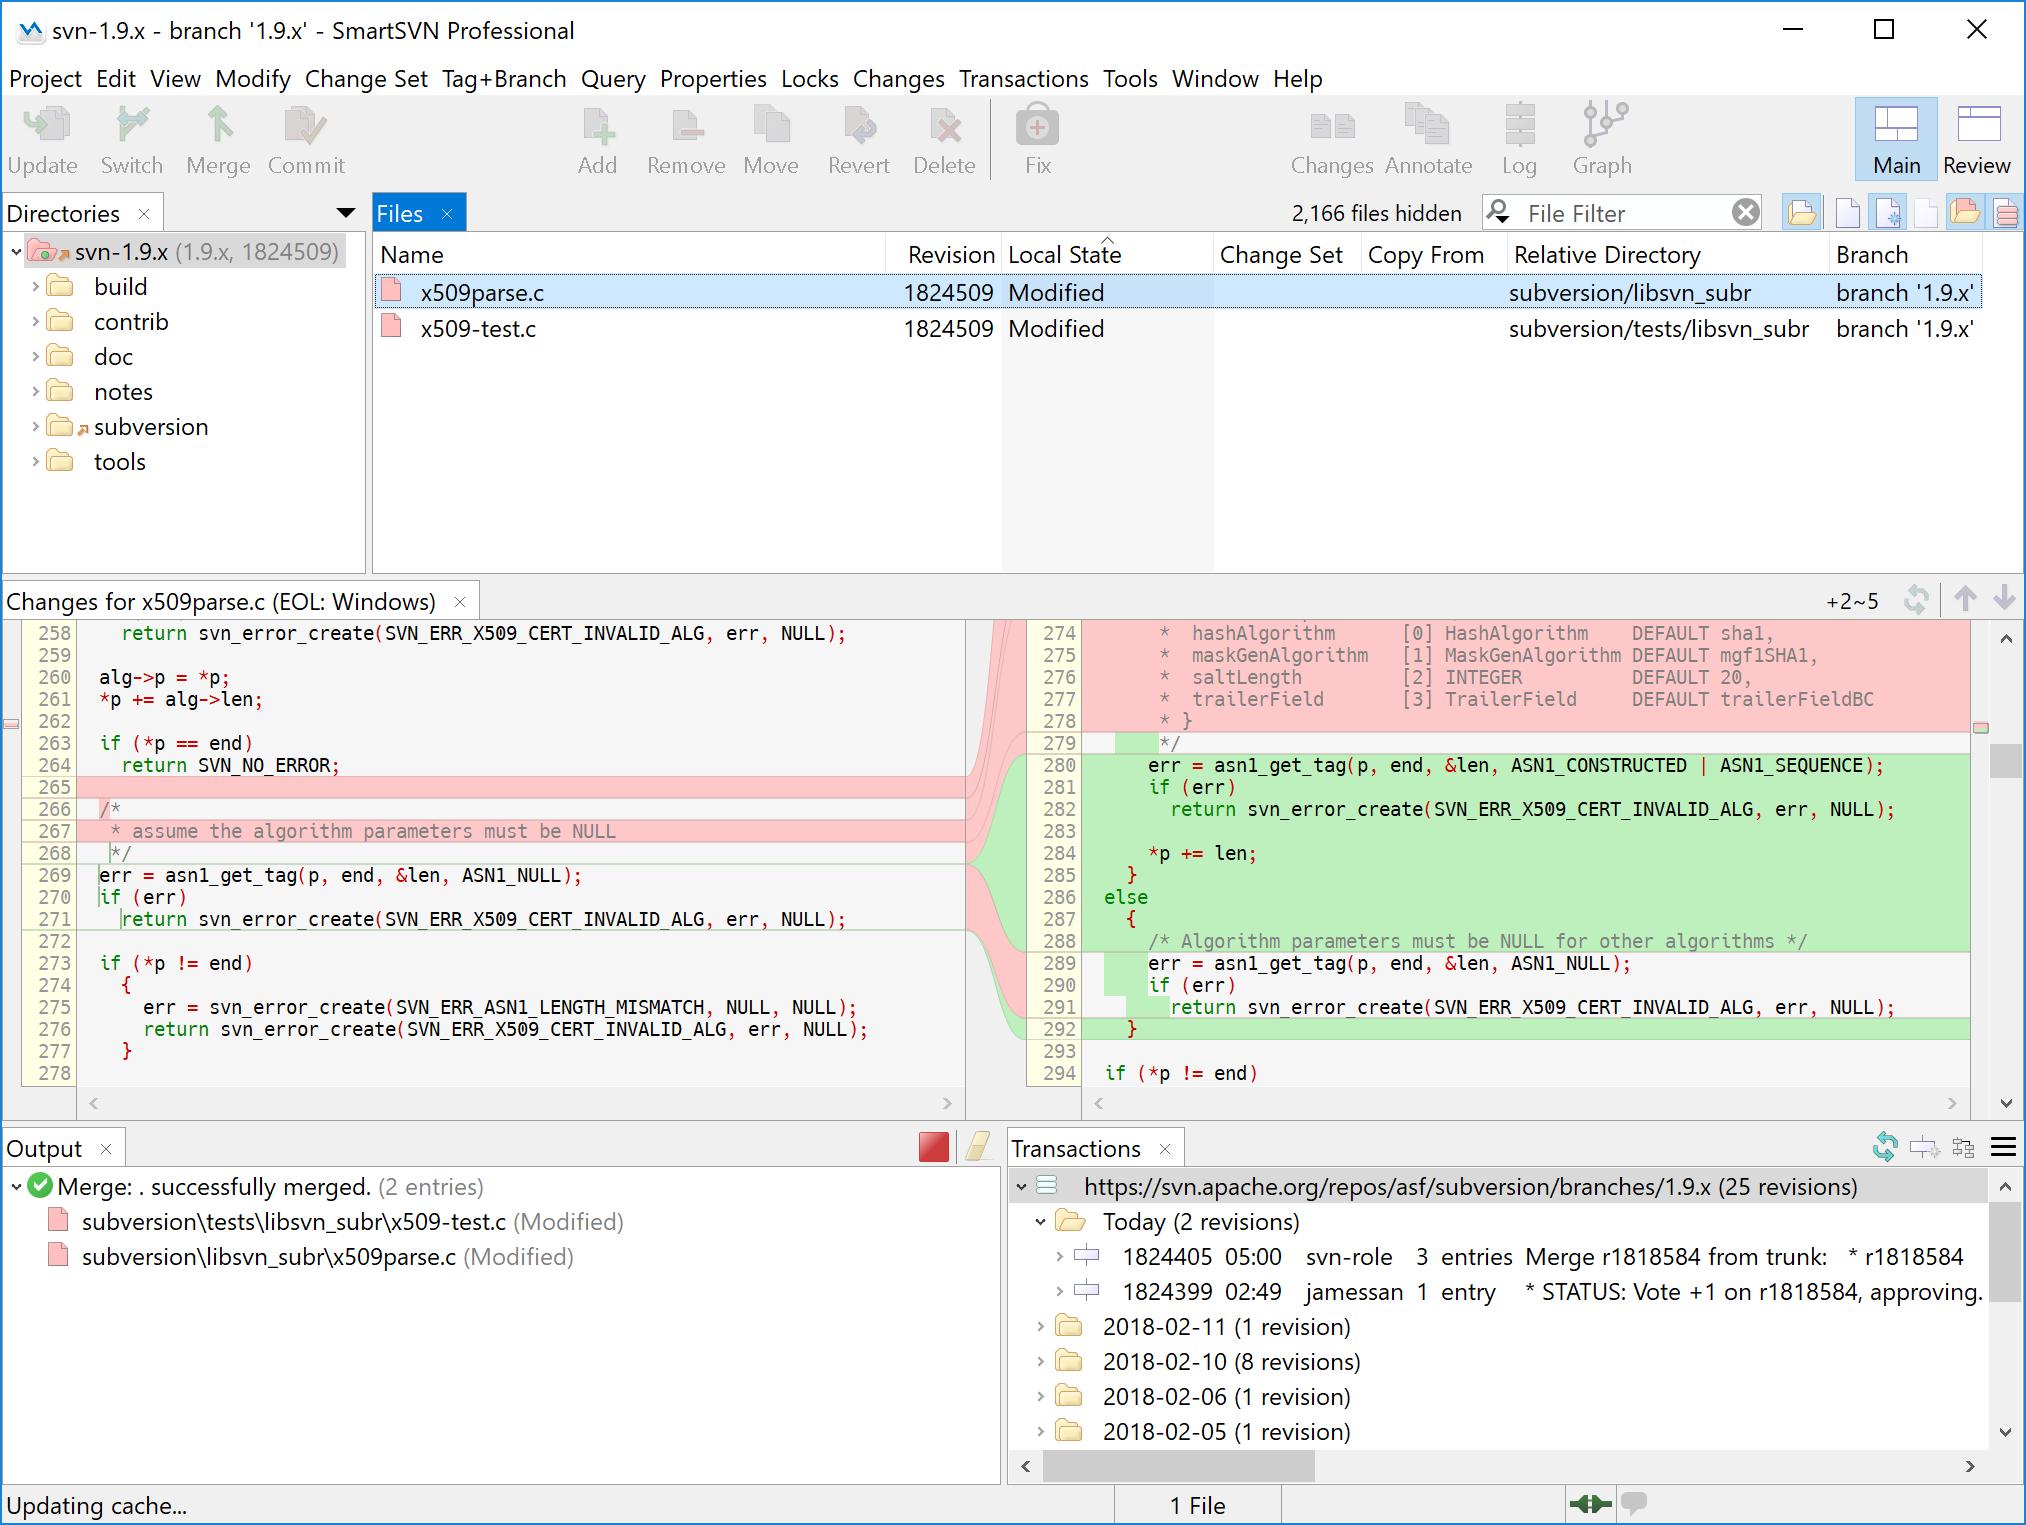 SmartSVN14.0.1 SmartSVN 14.0.1特别版